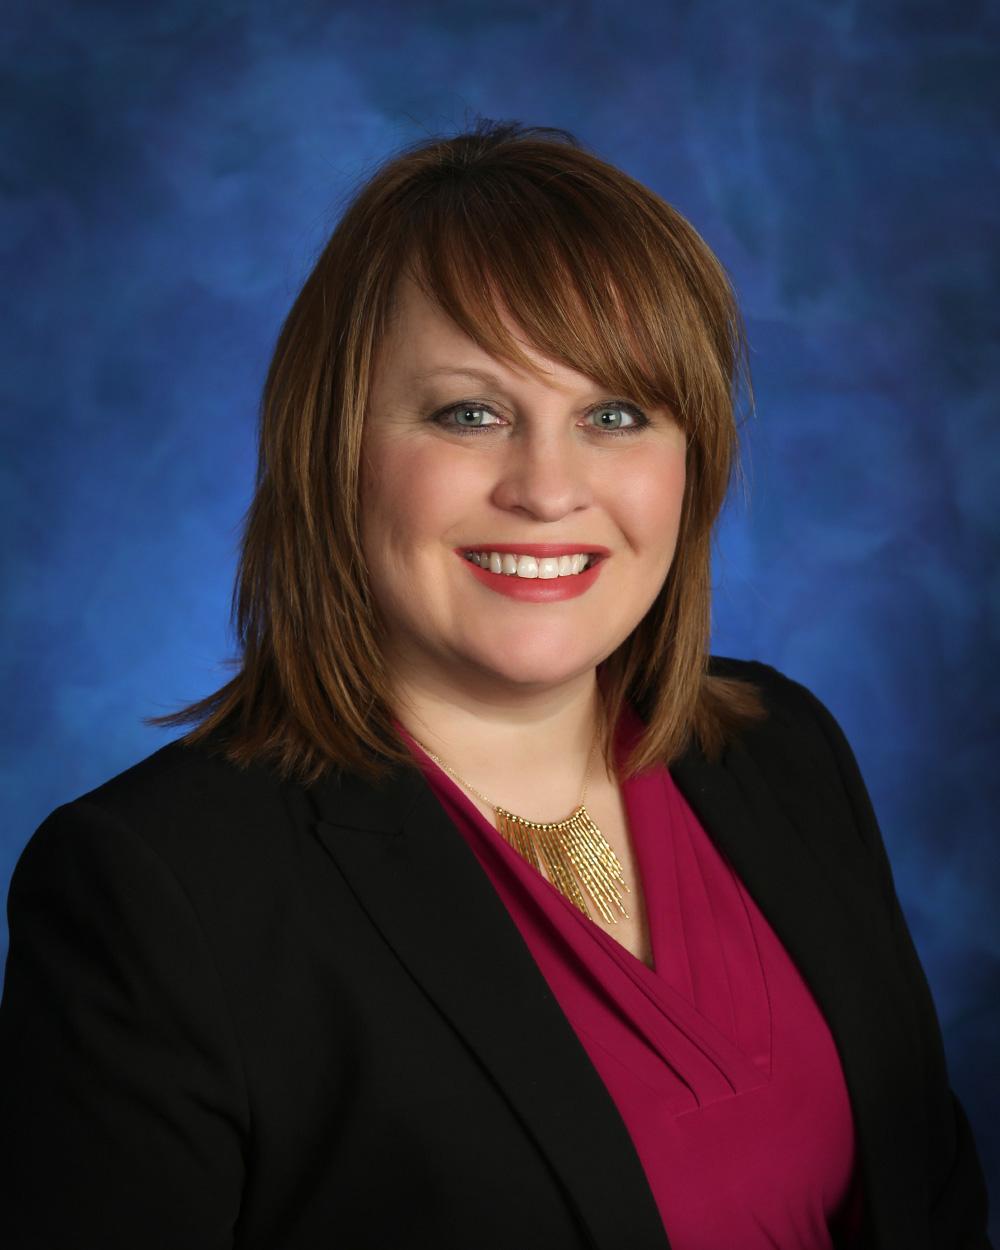 AnneMarie Spellman McDivitt